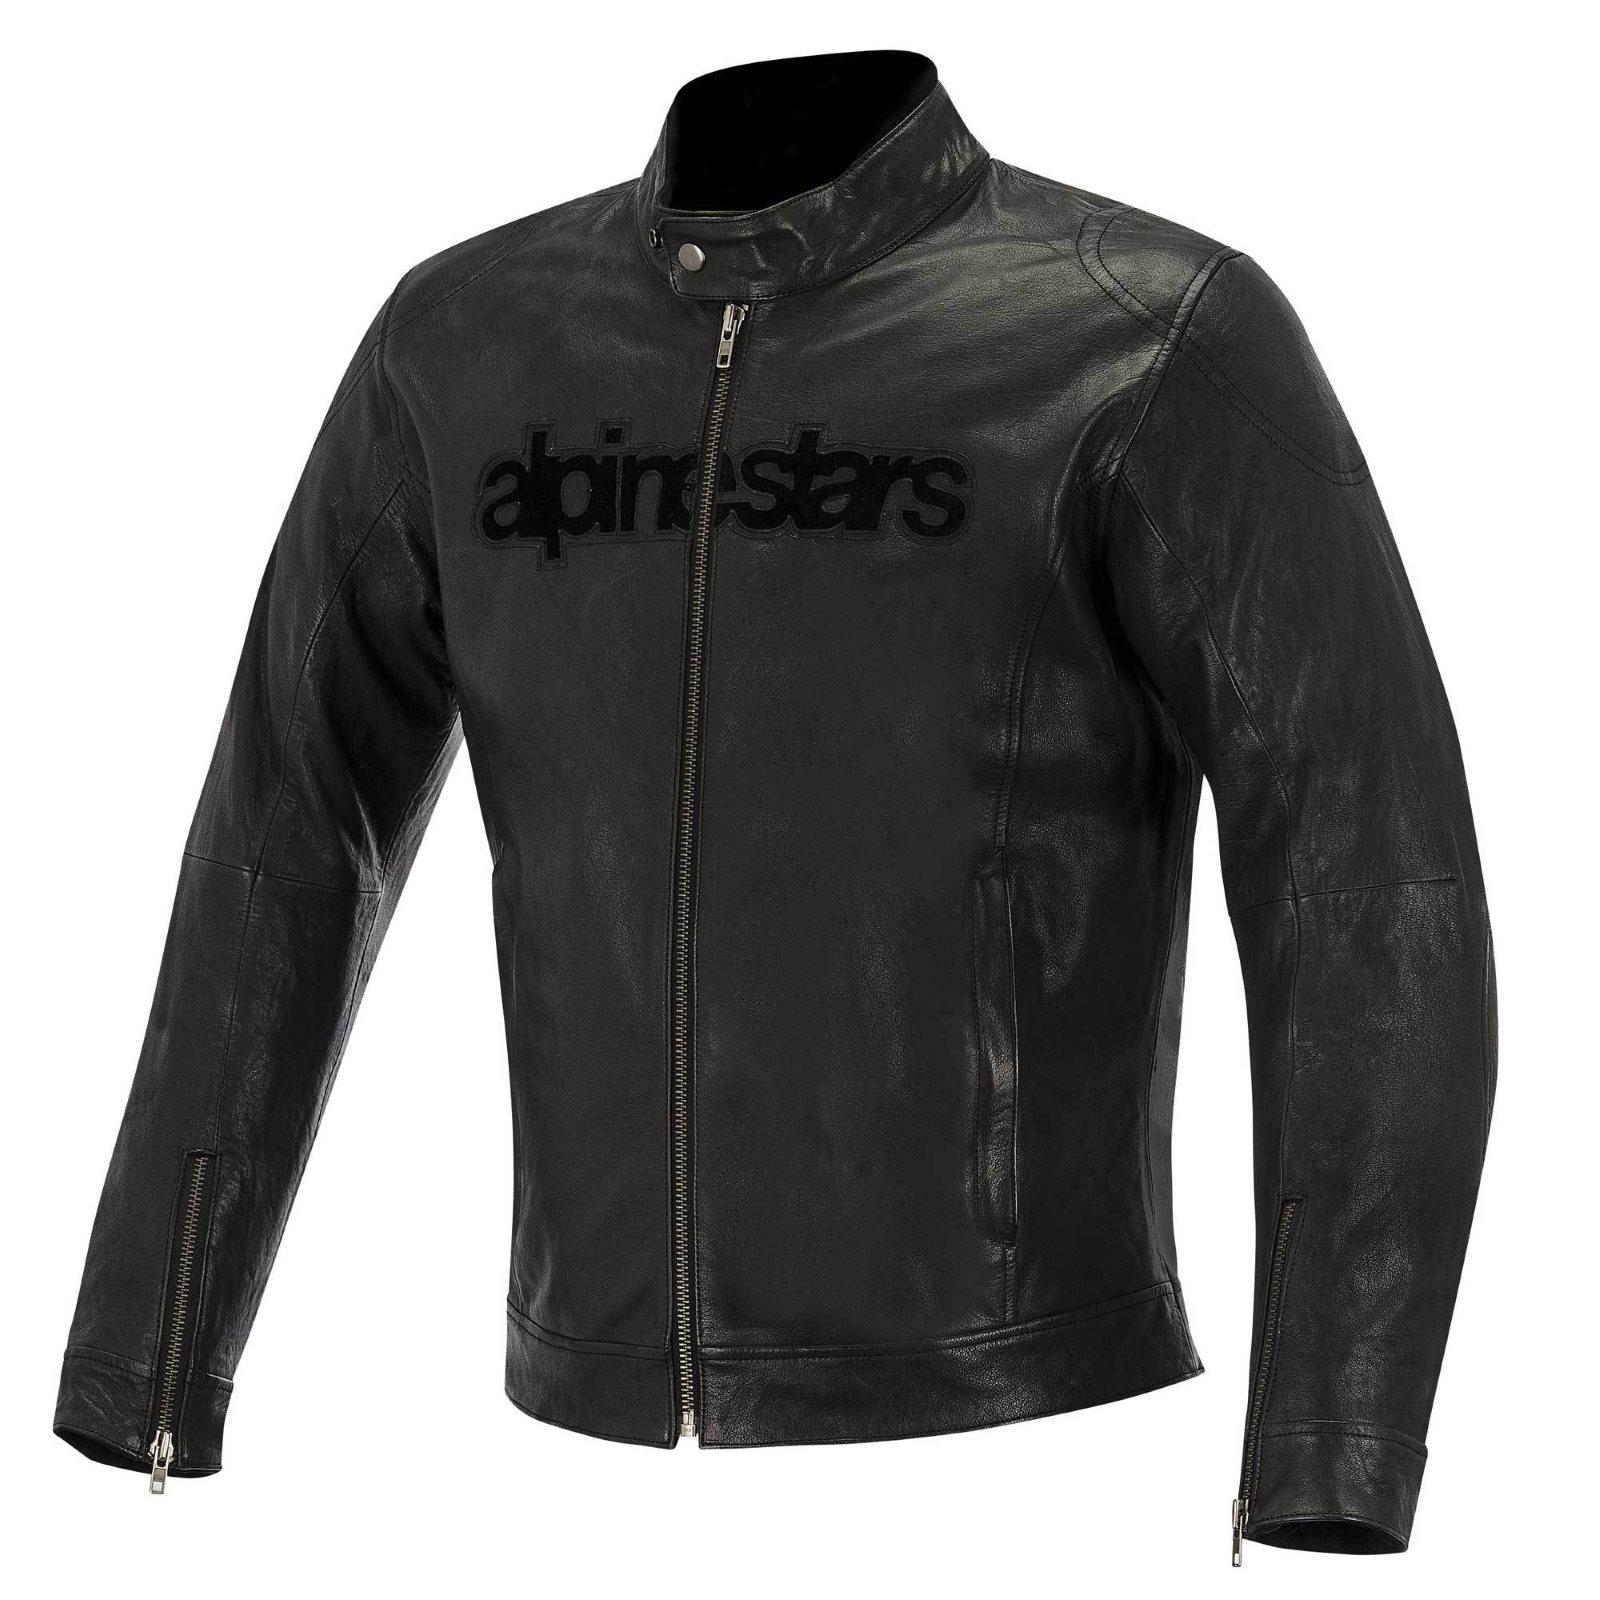 Alpinestars Leather Jacket >> Alpinestars Huntsman Leather Jacket Black M P Direct